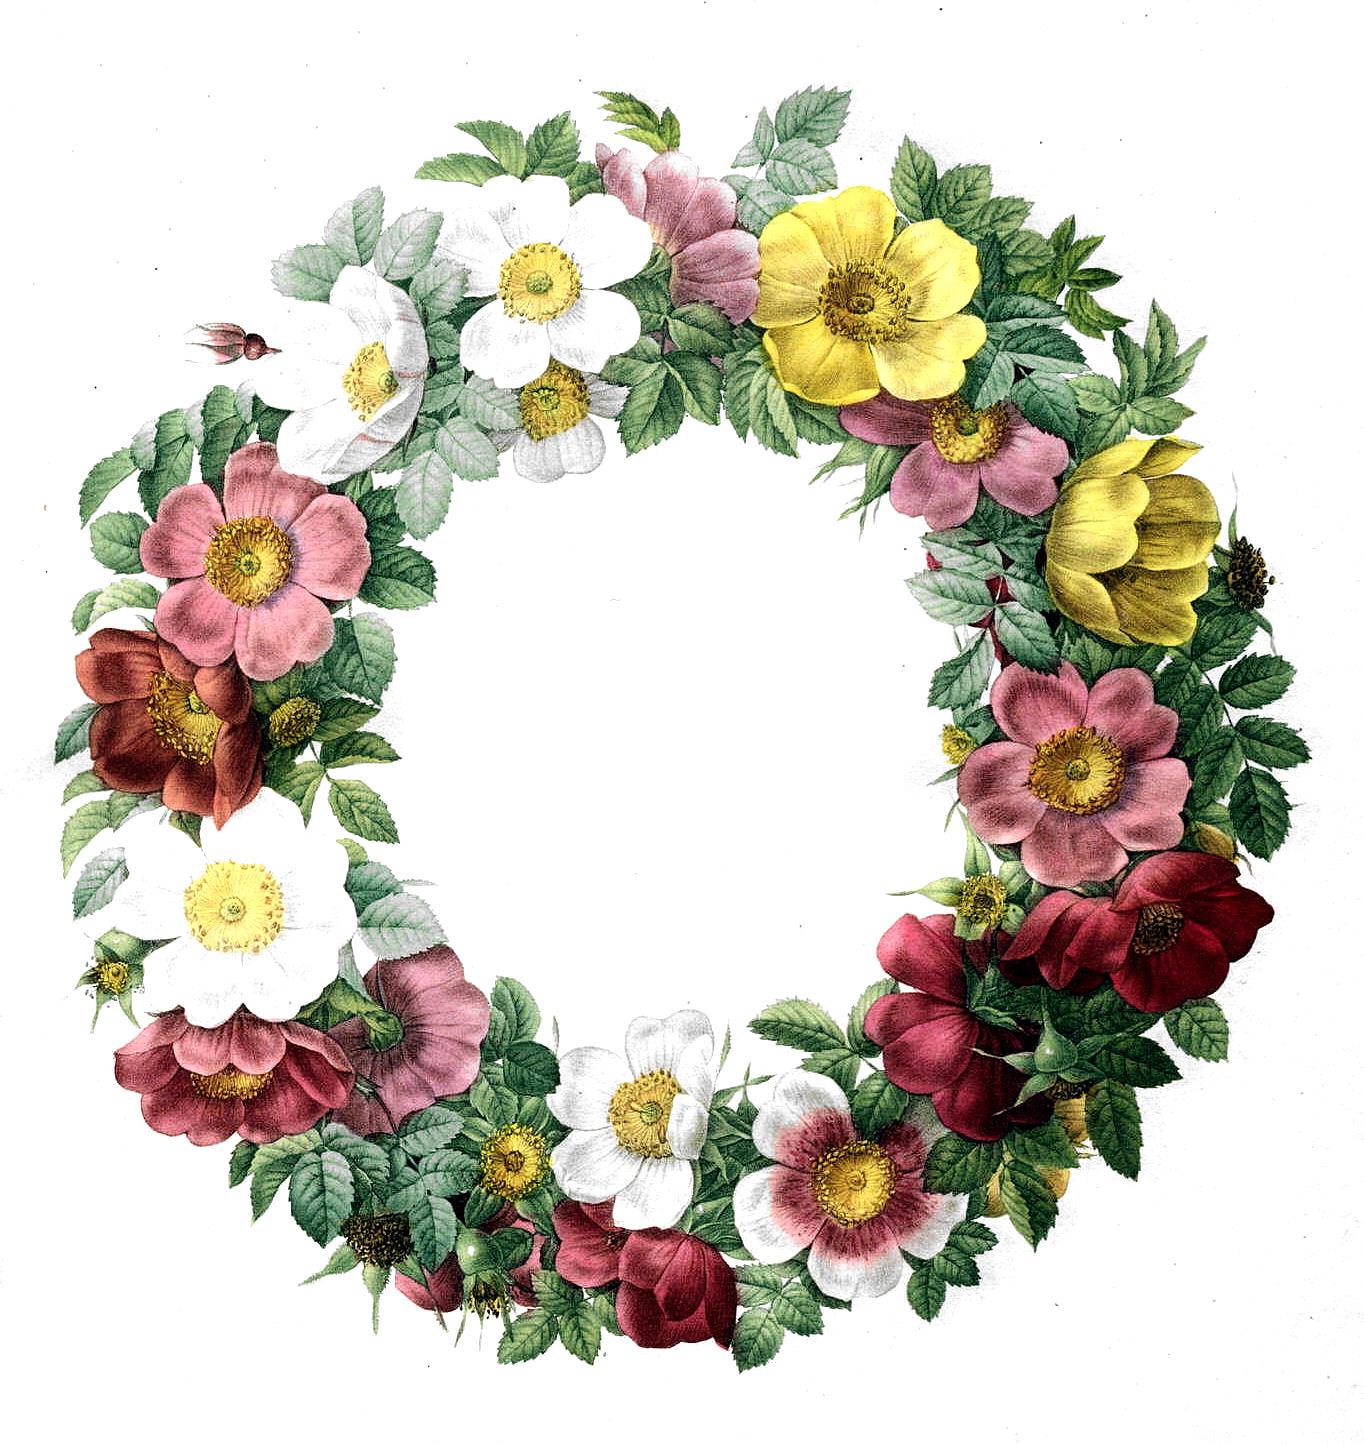 clipart flower wreath - photo #17